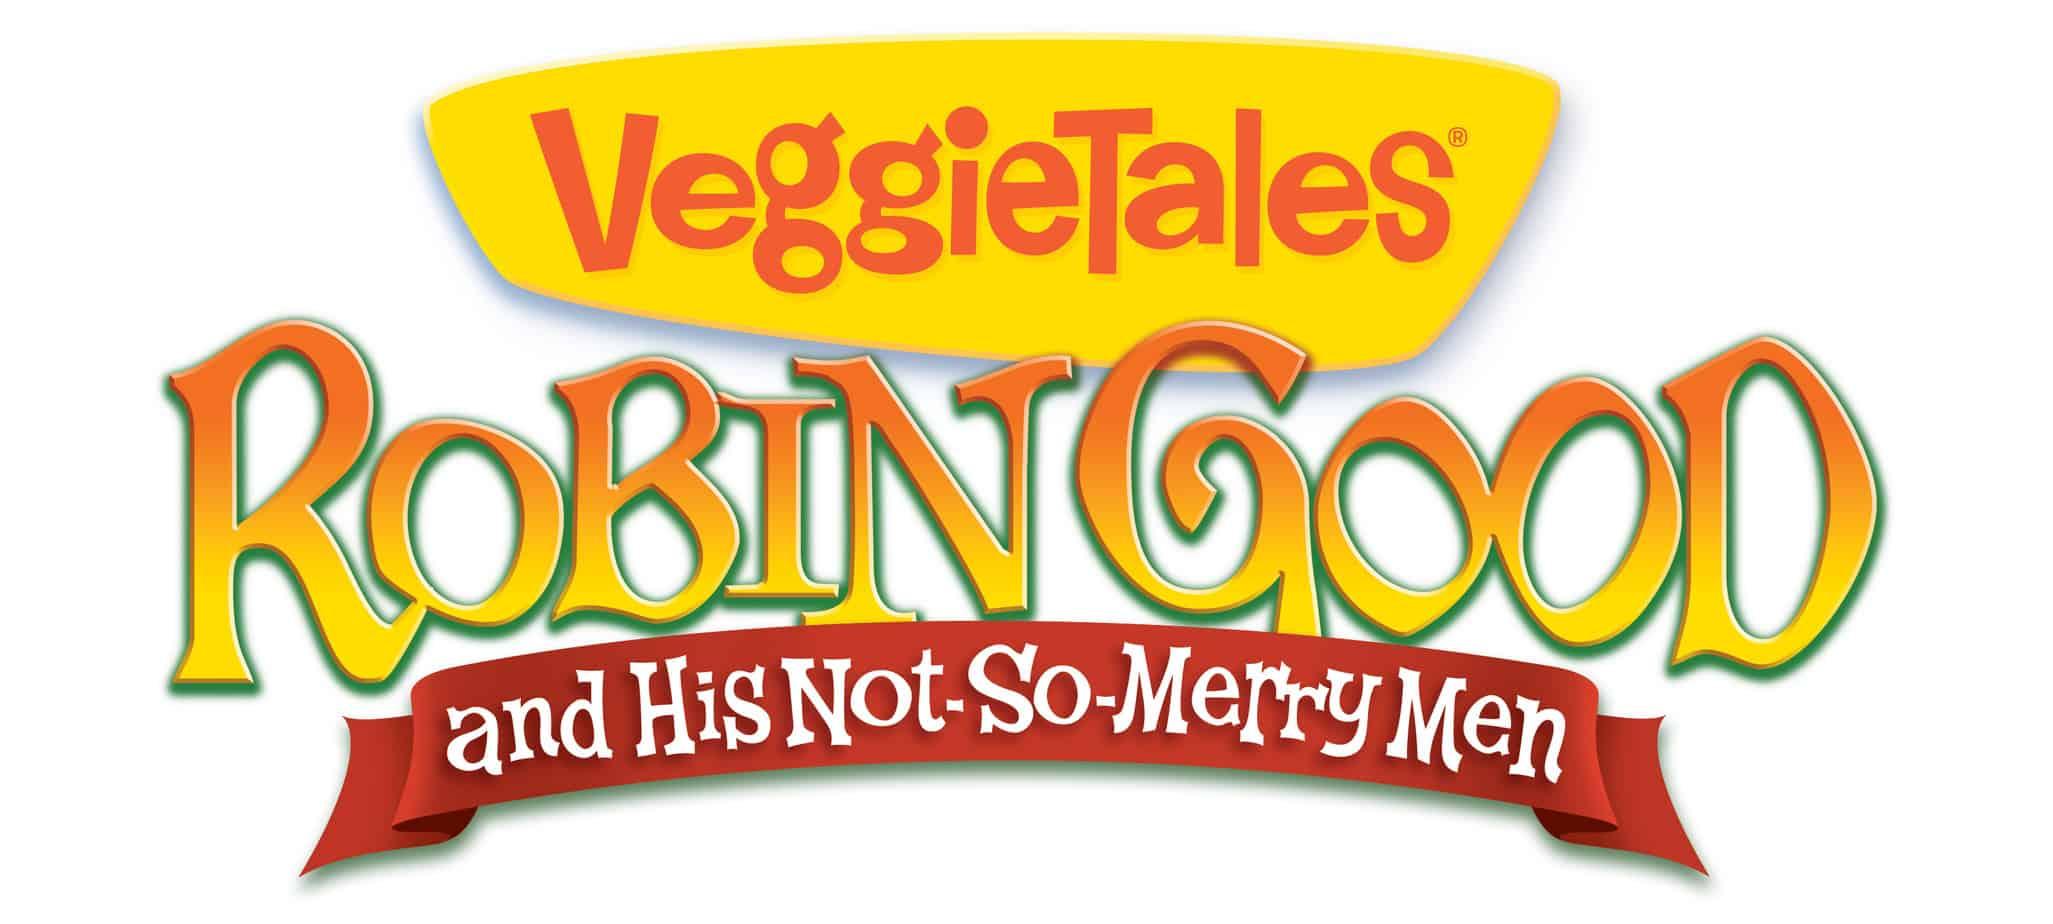 robin-good-veggie-tales